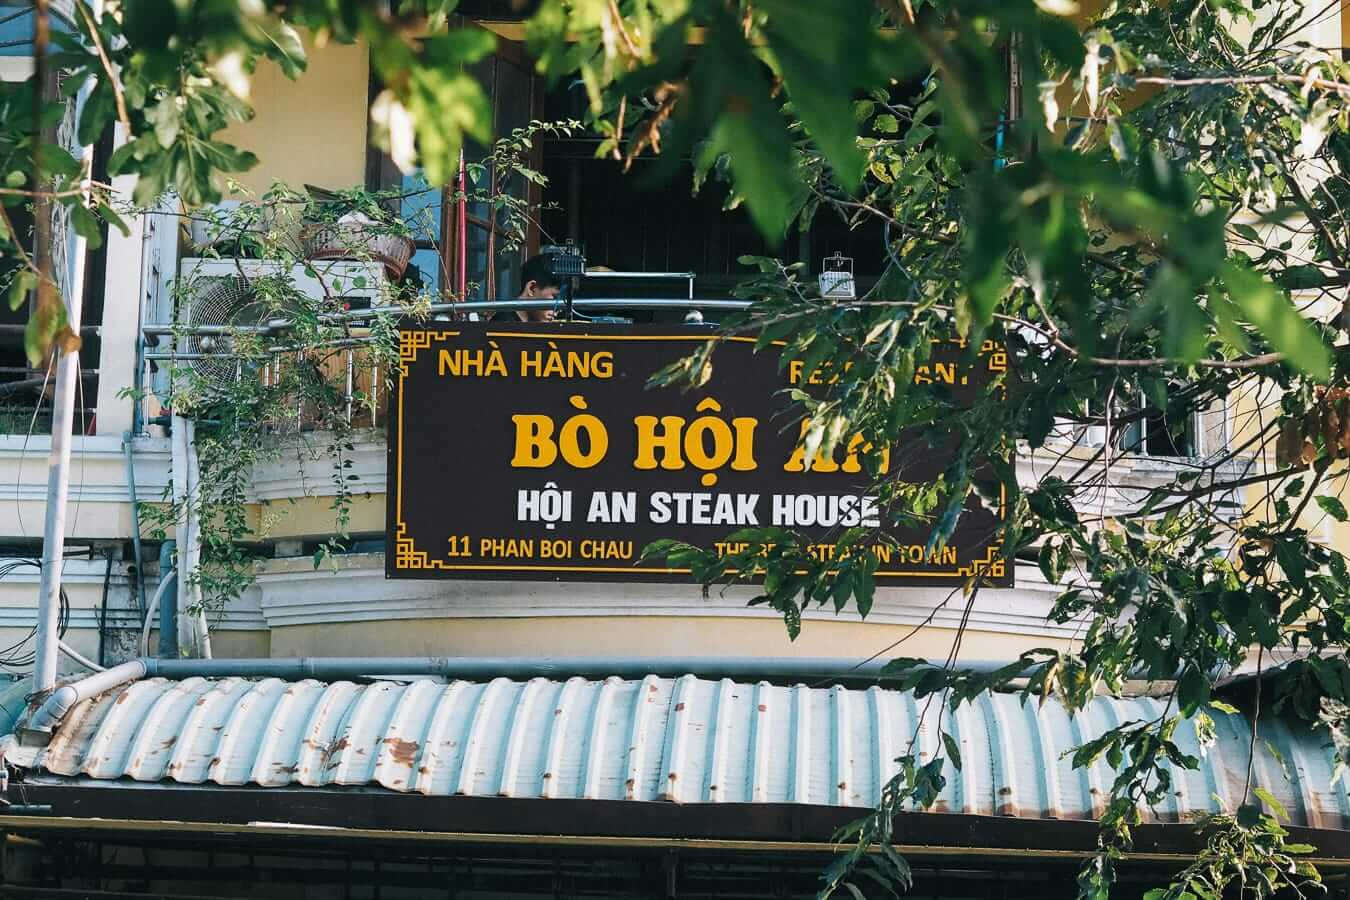 Hoi An Steak House: Western Hoi An Restaurants